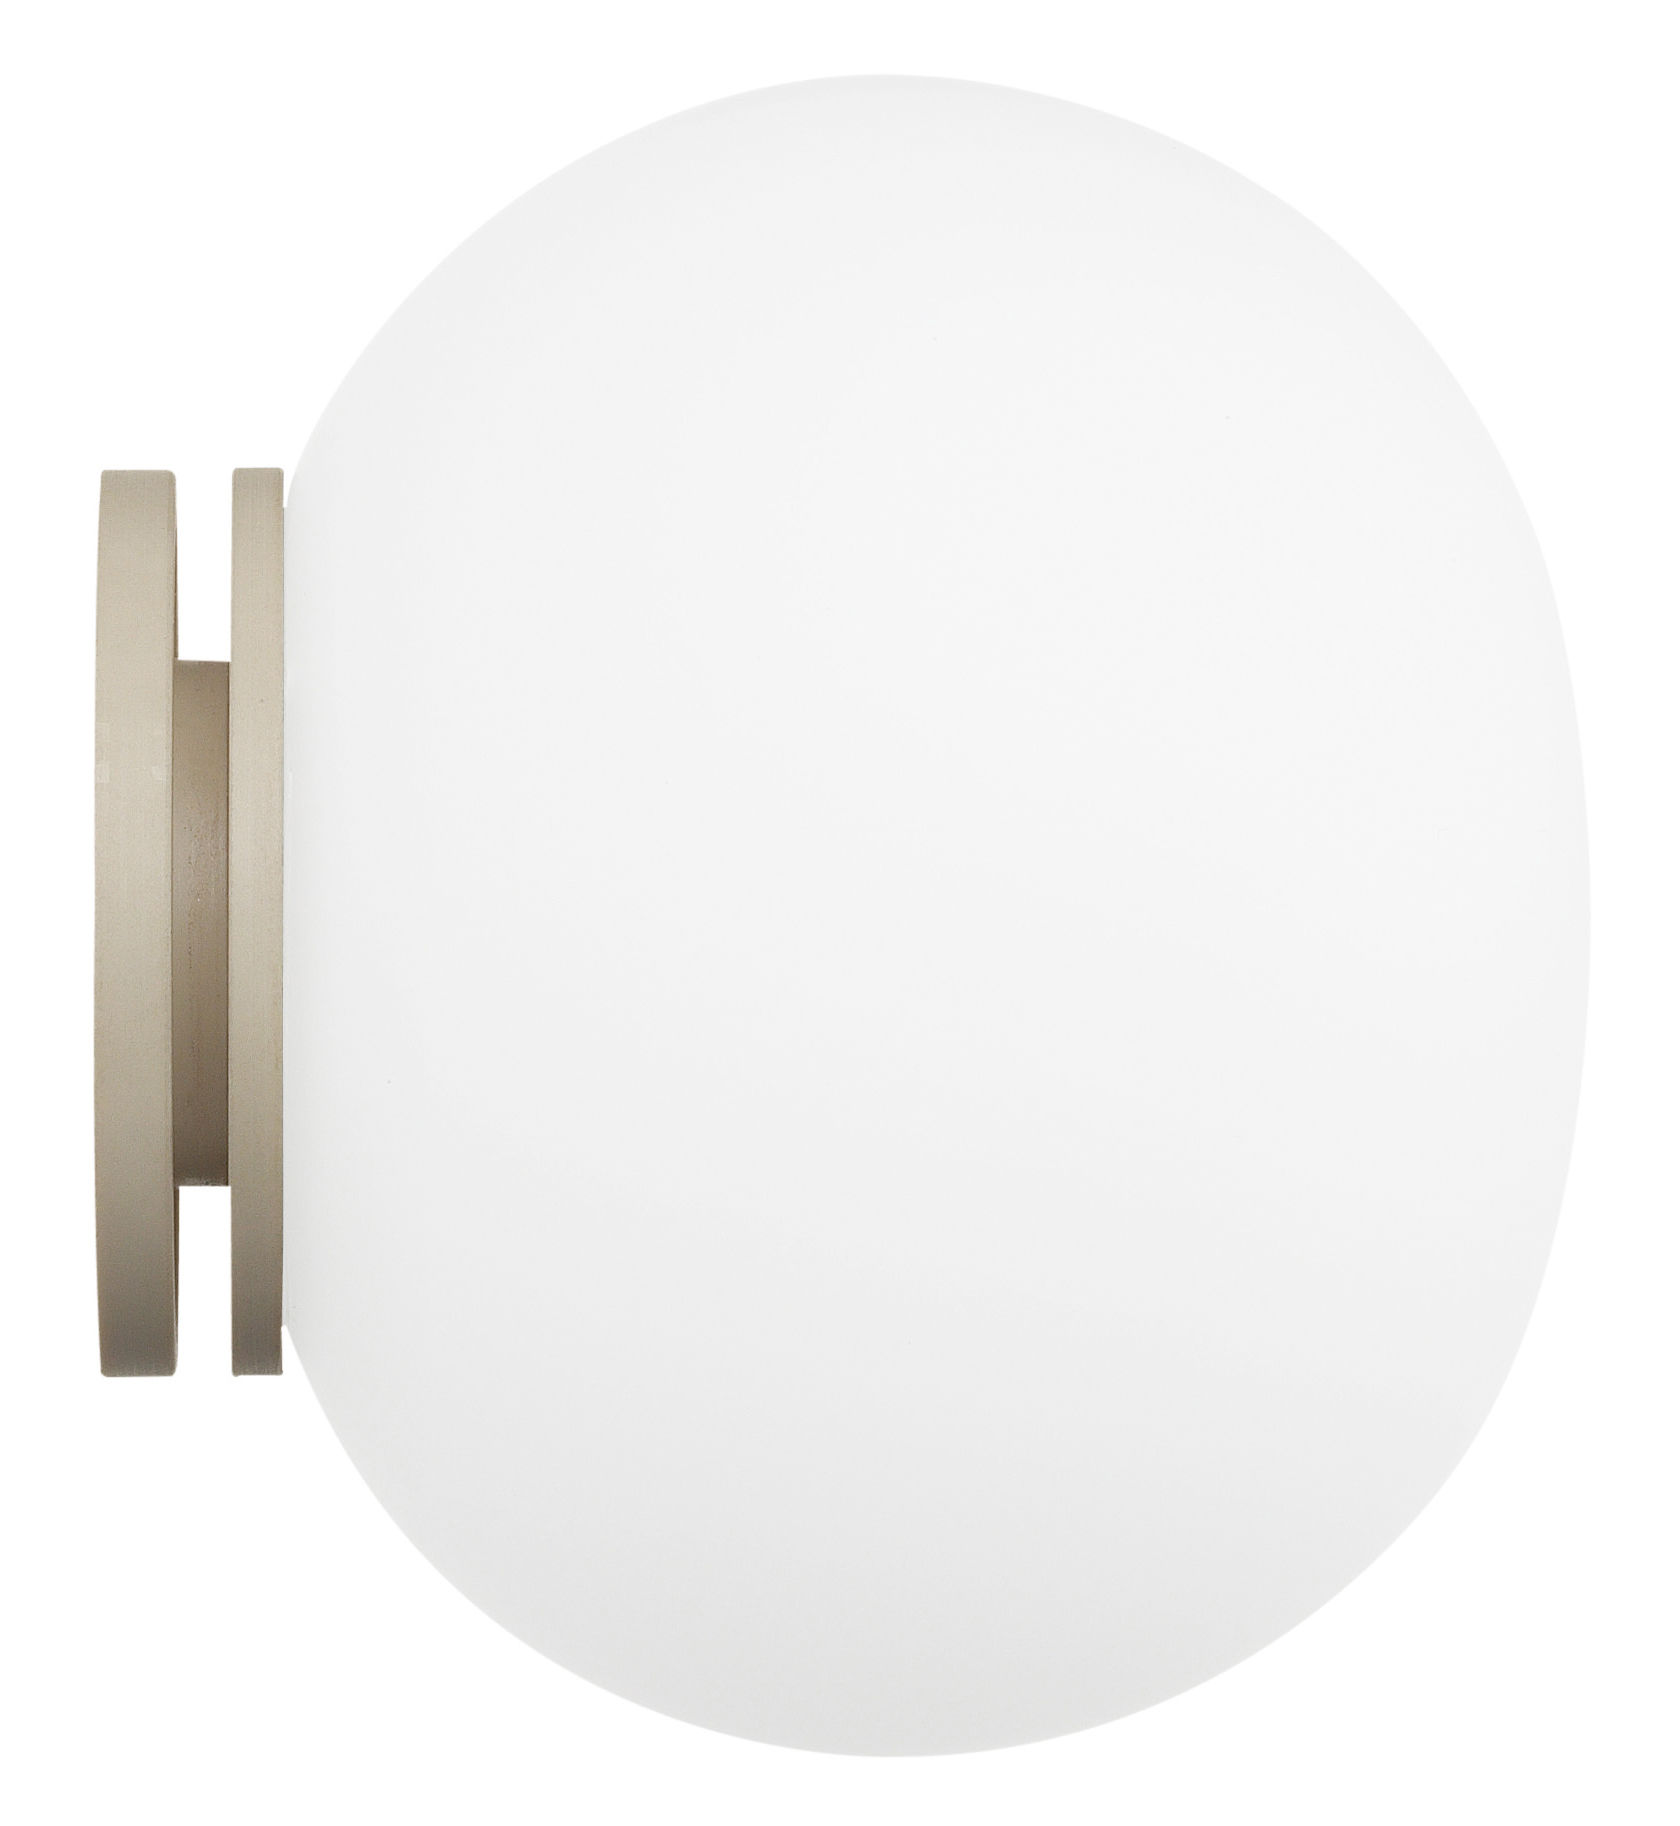 Mini glo ball wall light ceiling light white by flos for Applique salle de bain flos